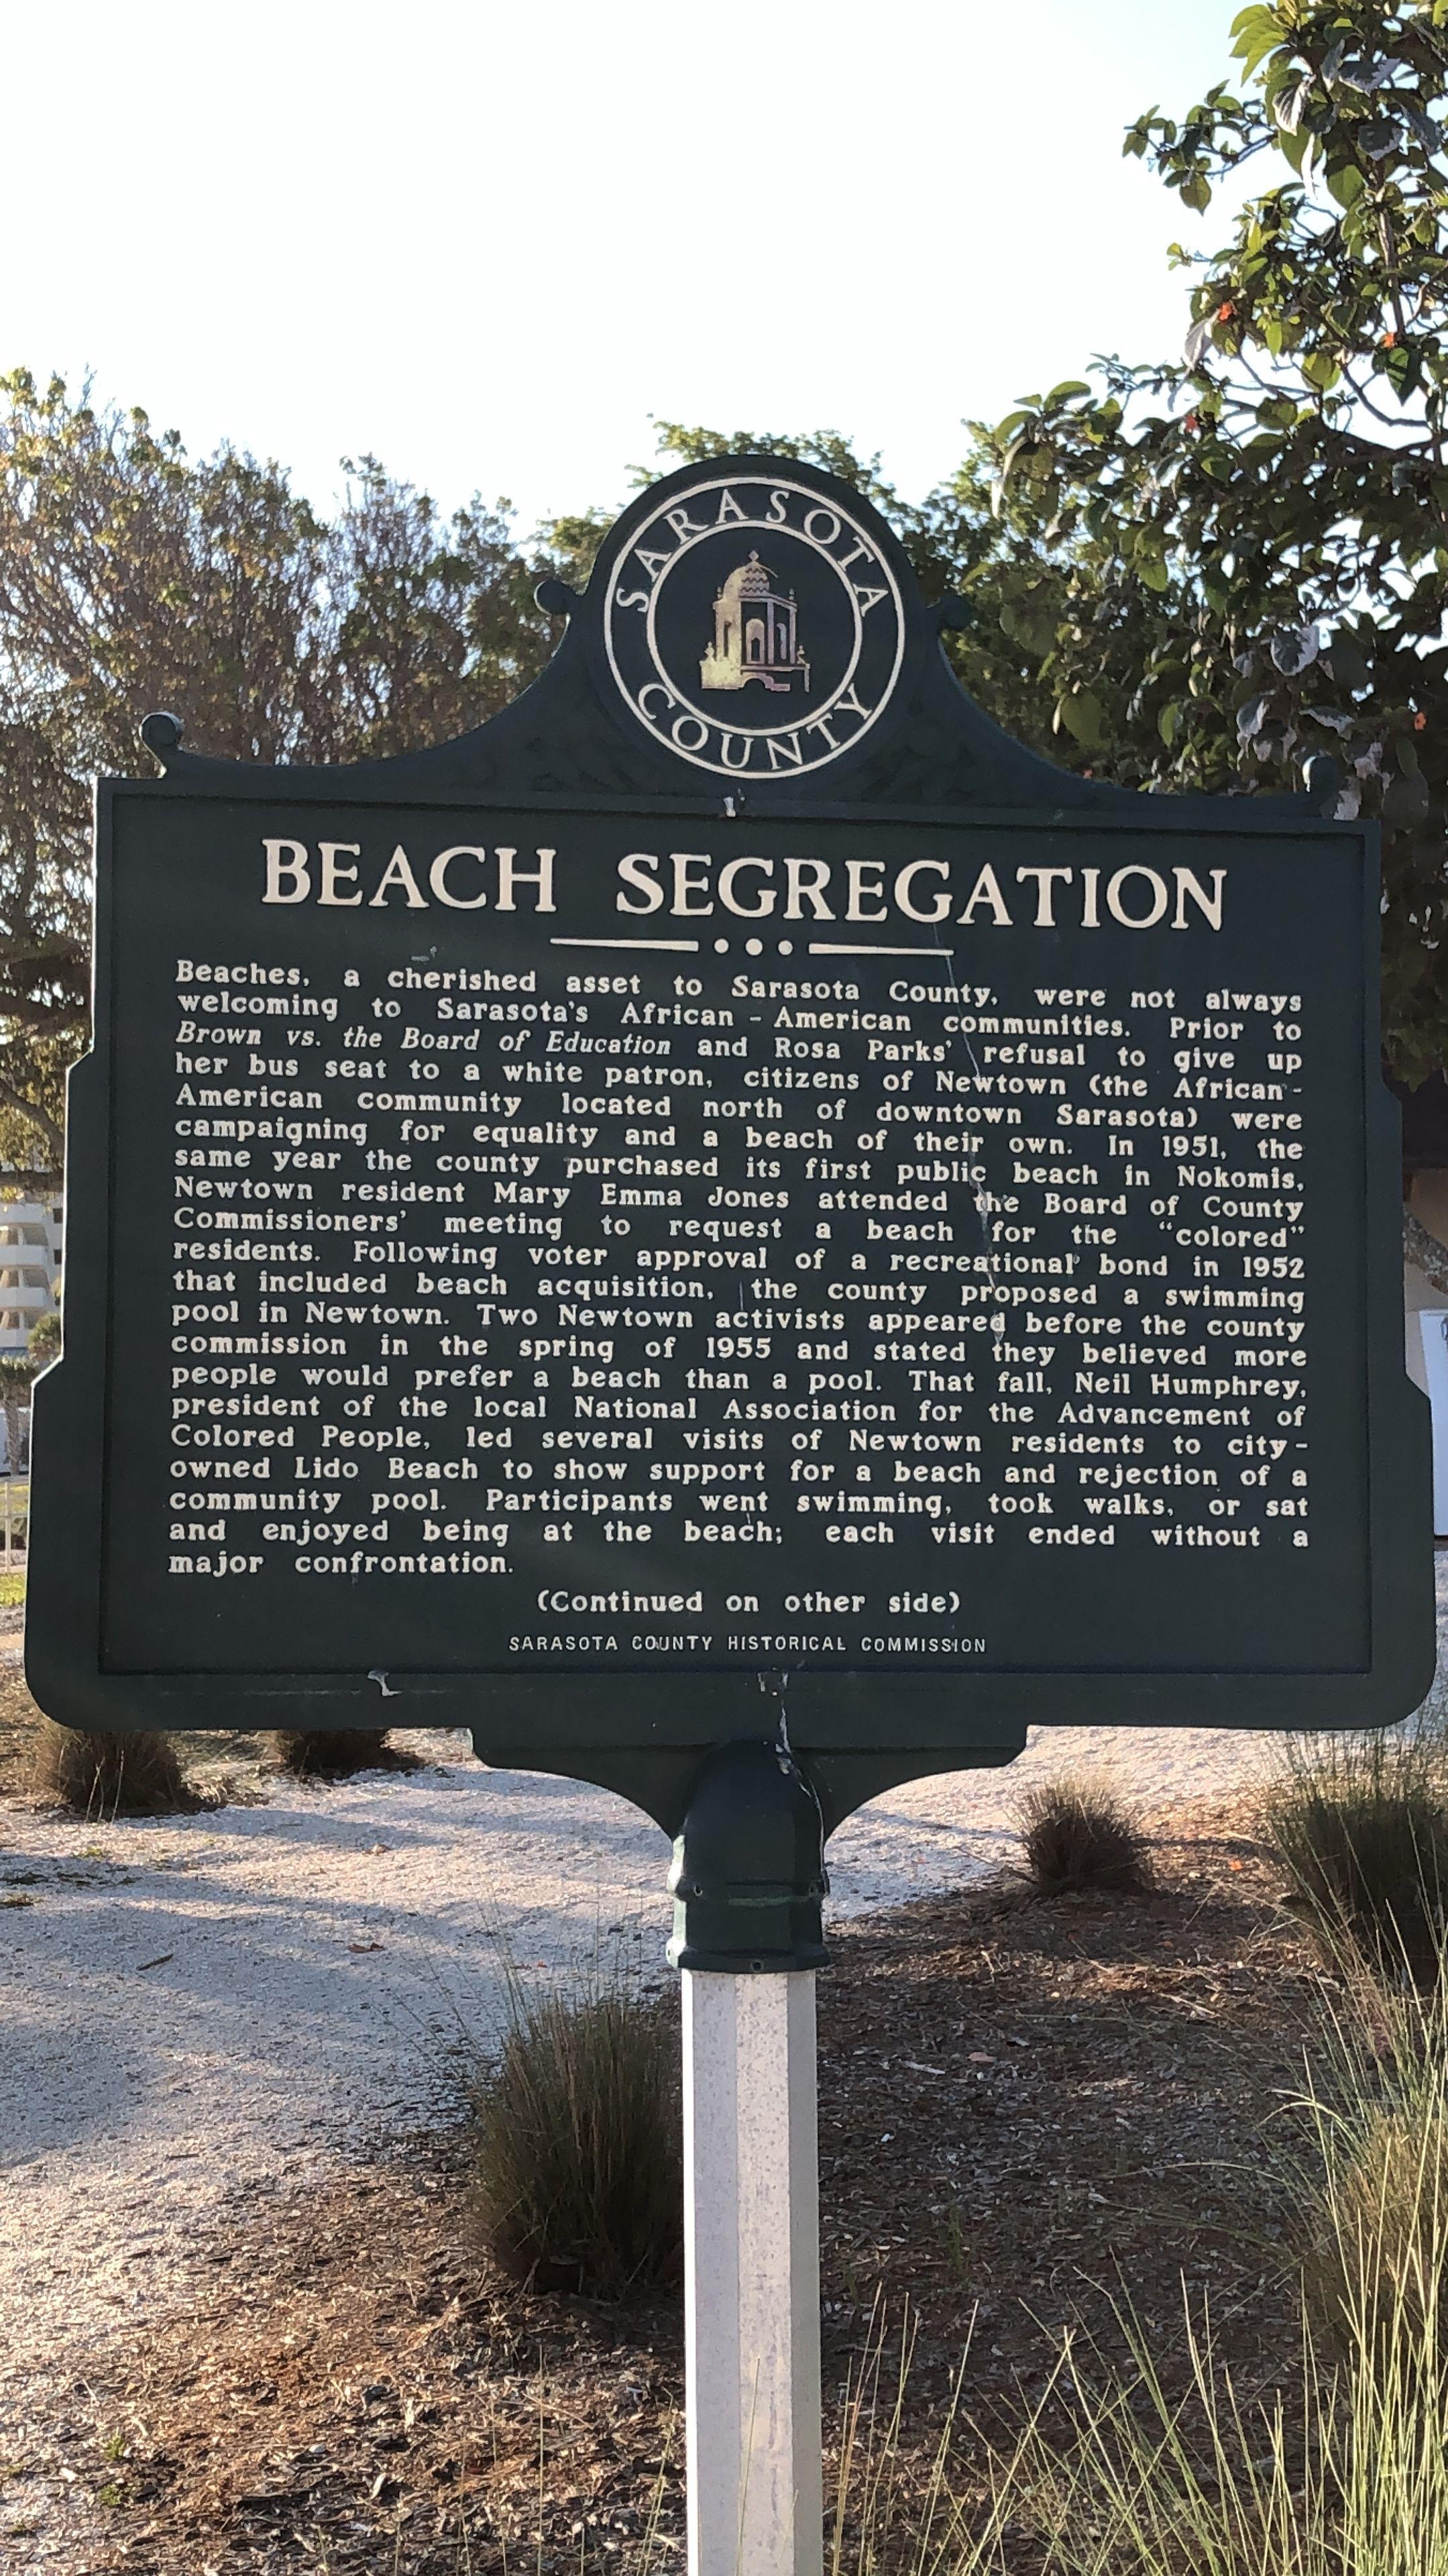 Beach segregation information